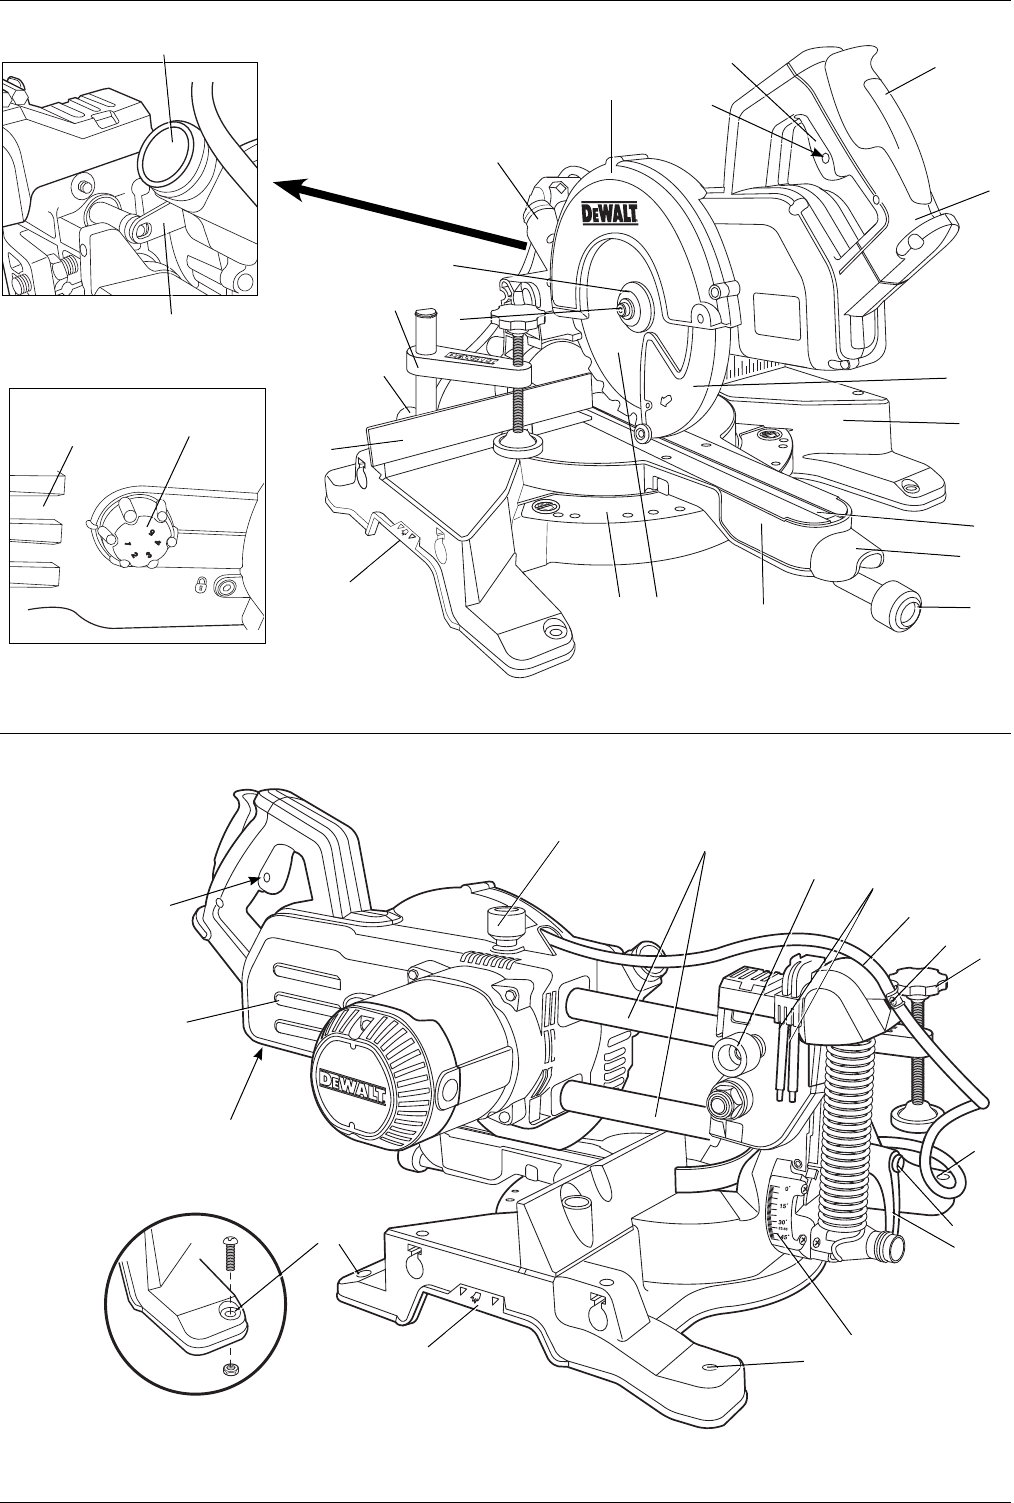 Omtalade Handleiding DeWalt DW777 T 2 (pagina 96 van 124) (Dansk, Deutsch BB-27